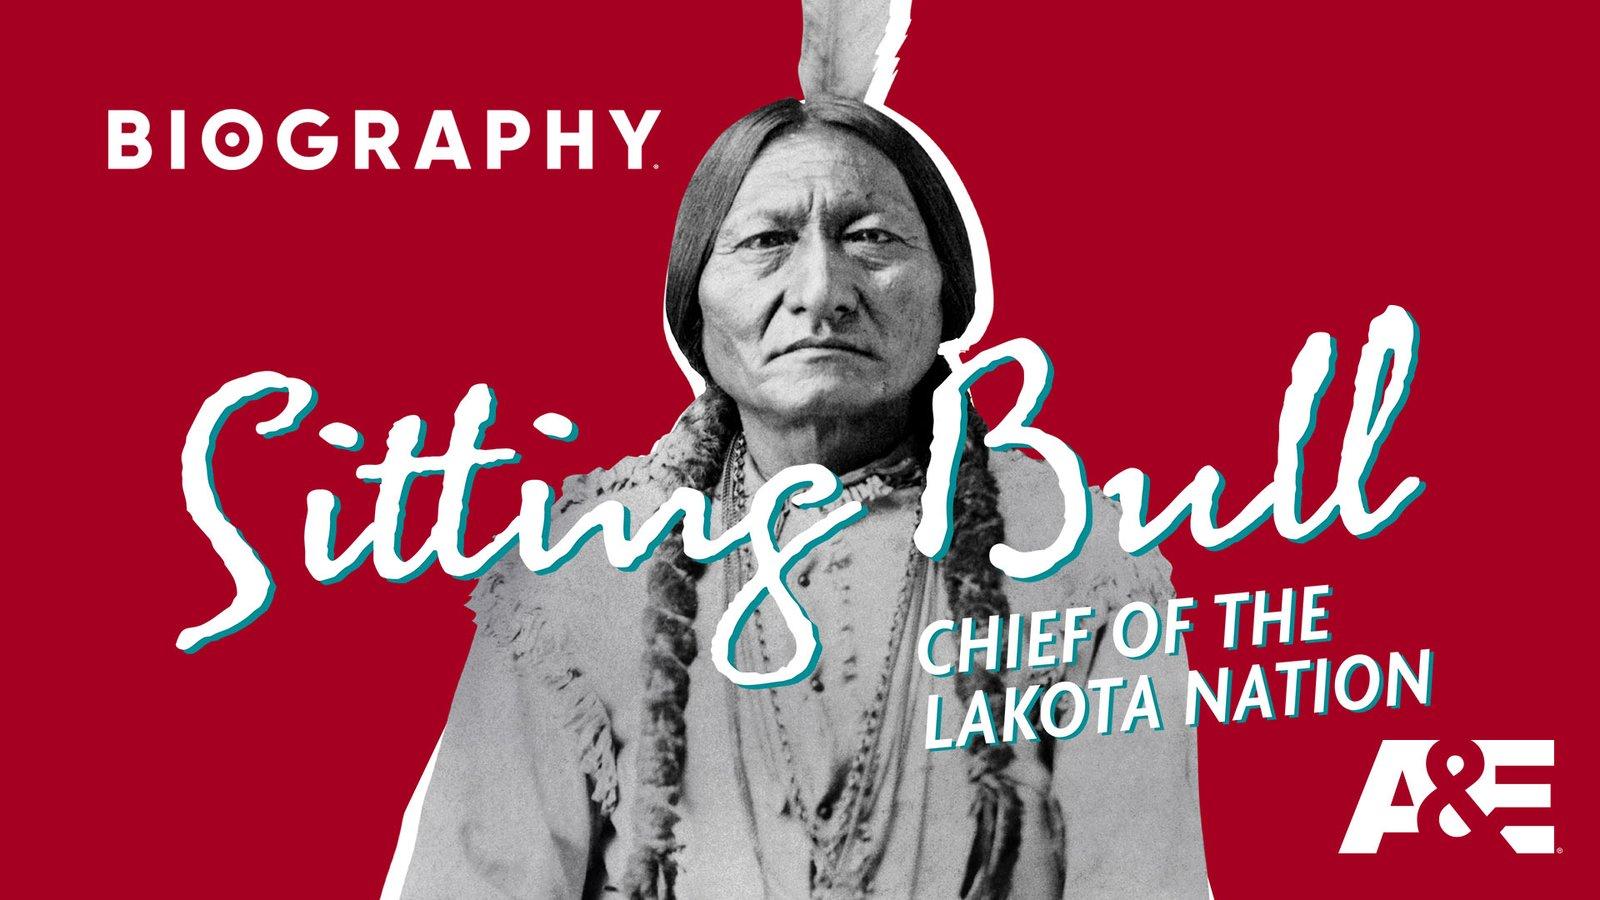 Sitting Bull: Chief of the Lakota Nation